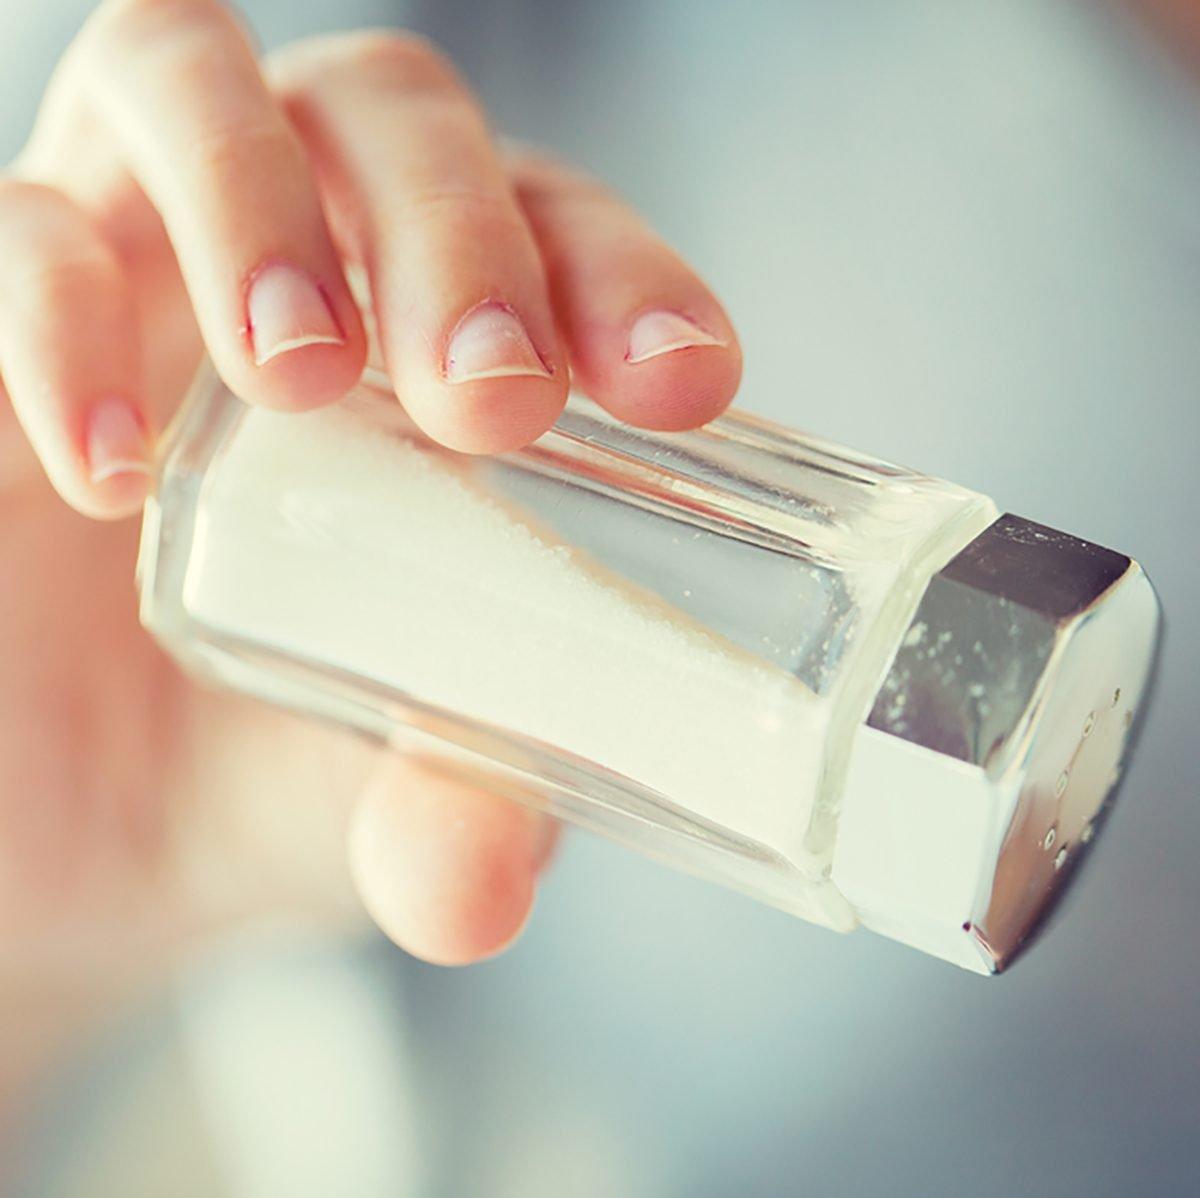 close up of hand holding white salt